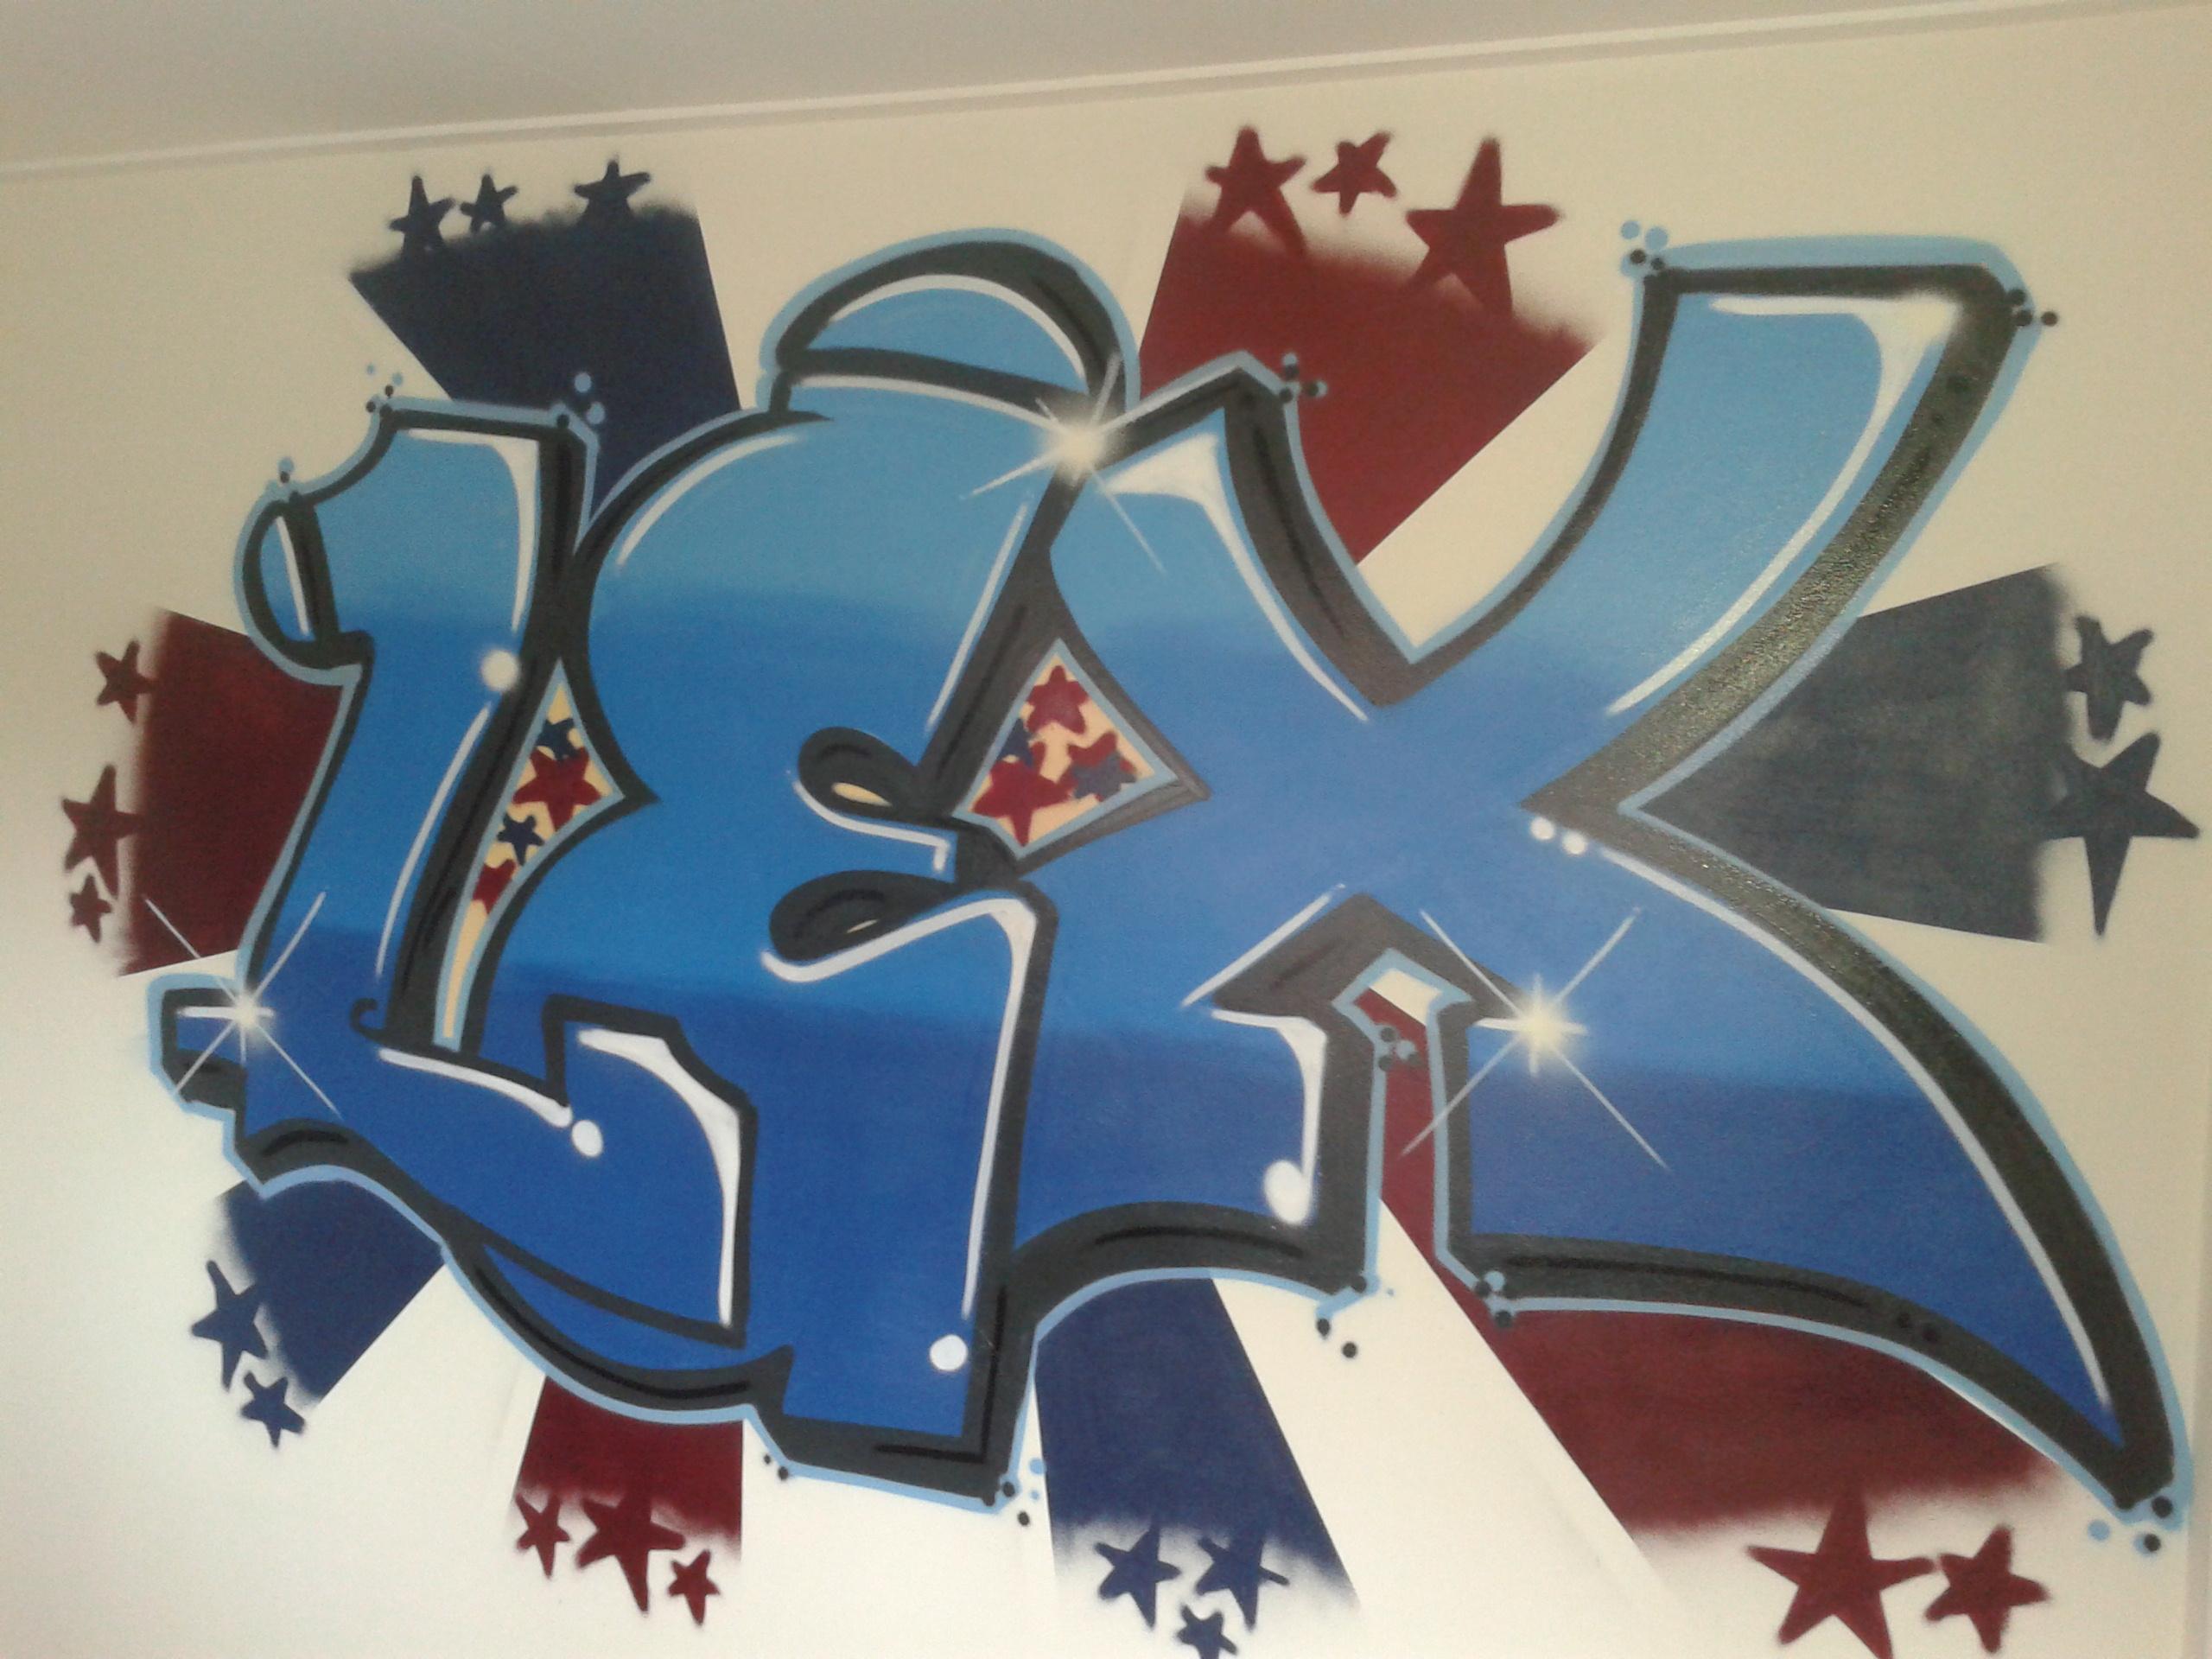 Graffiti Voor Slaapkamer : Graffiti op slaapkamer van Lex - Graffiti ...